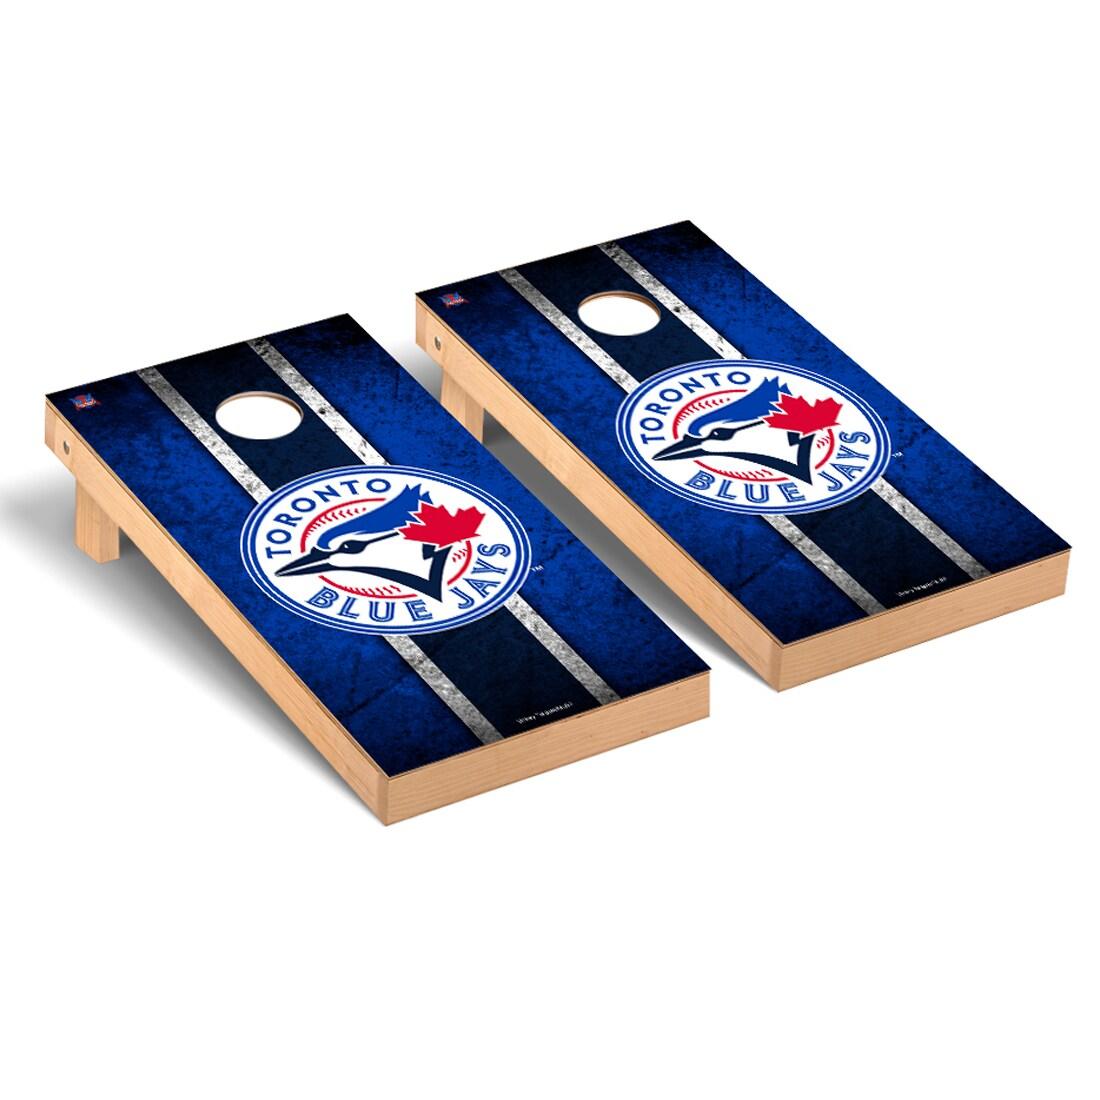 Toronto Blue Jays 2' x 4' Vintage Cornhole Board Tailgate Toss Set